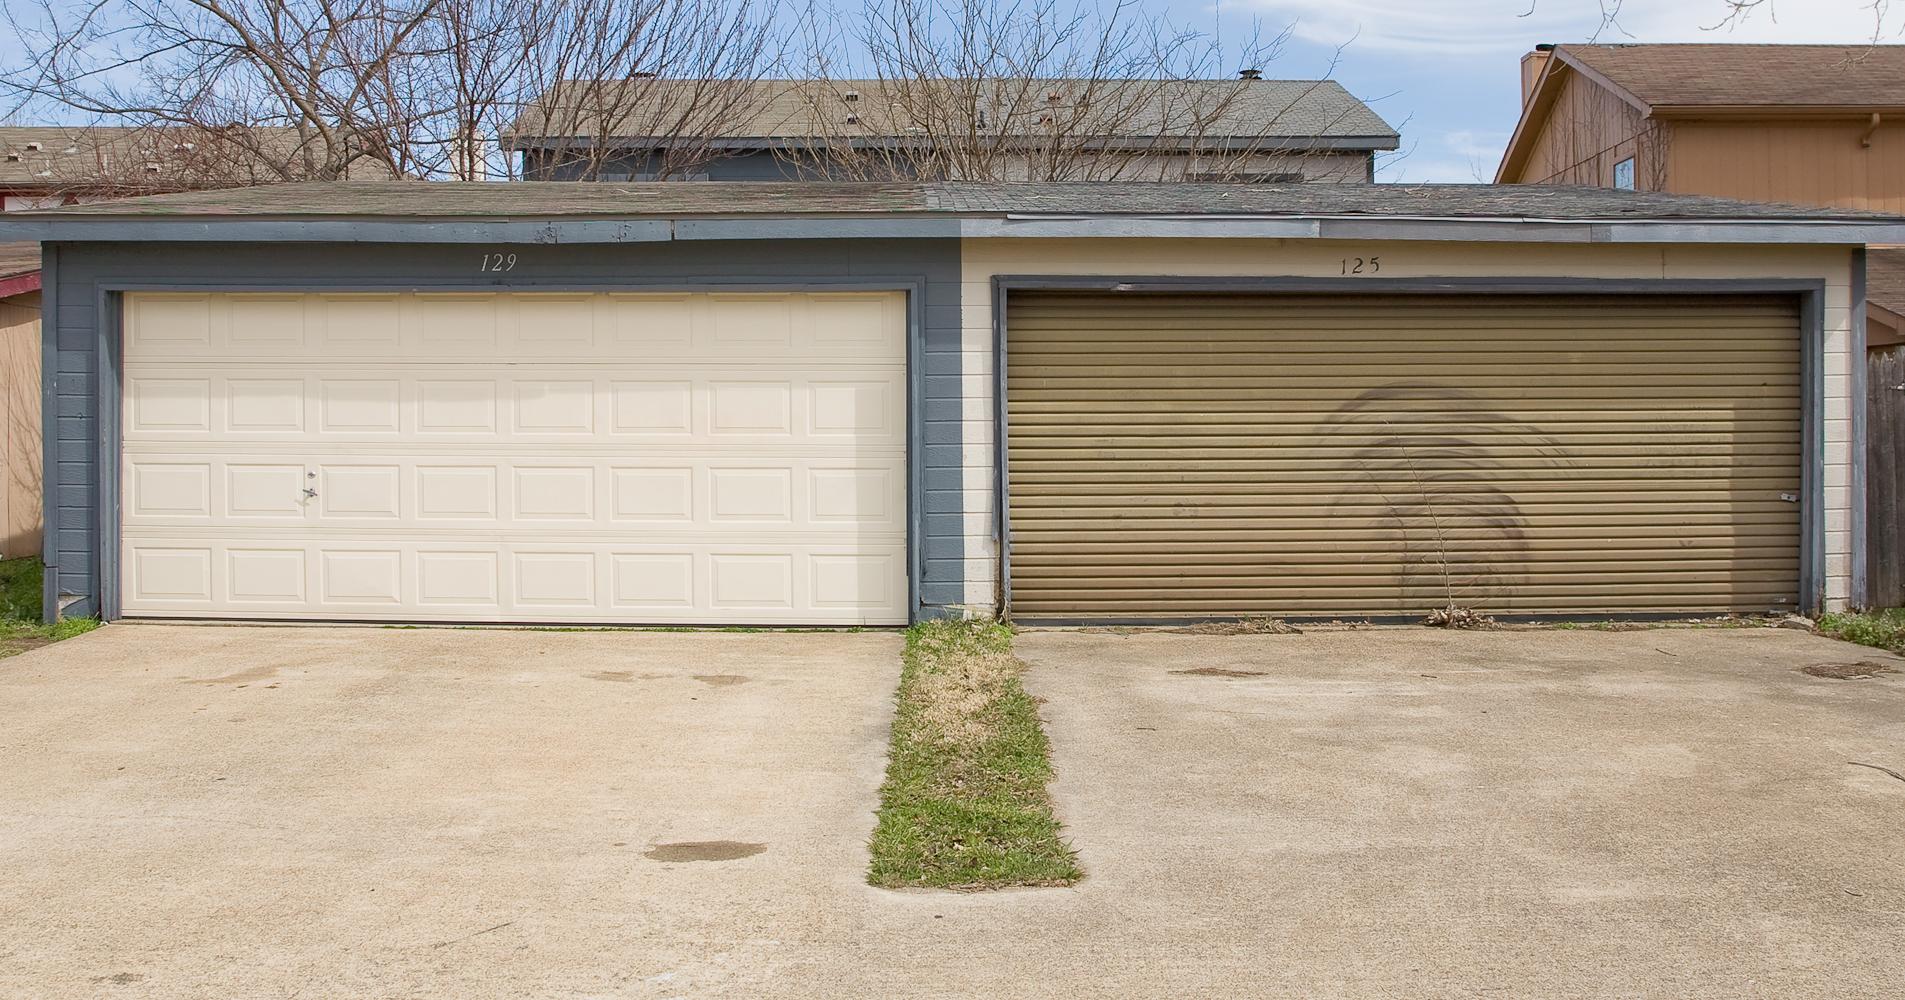 Duplex Homes 2 (2 of 9).jpg